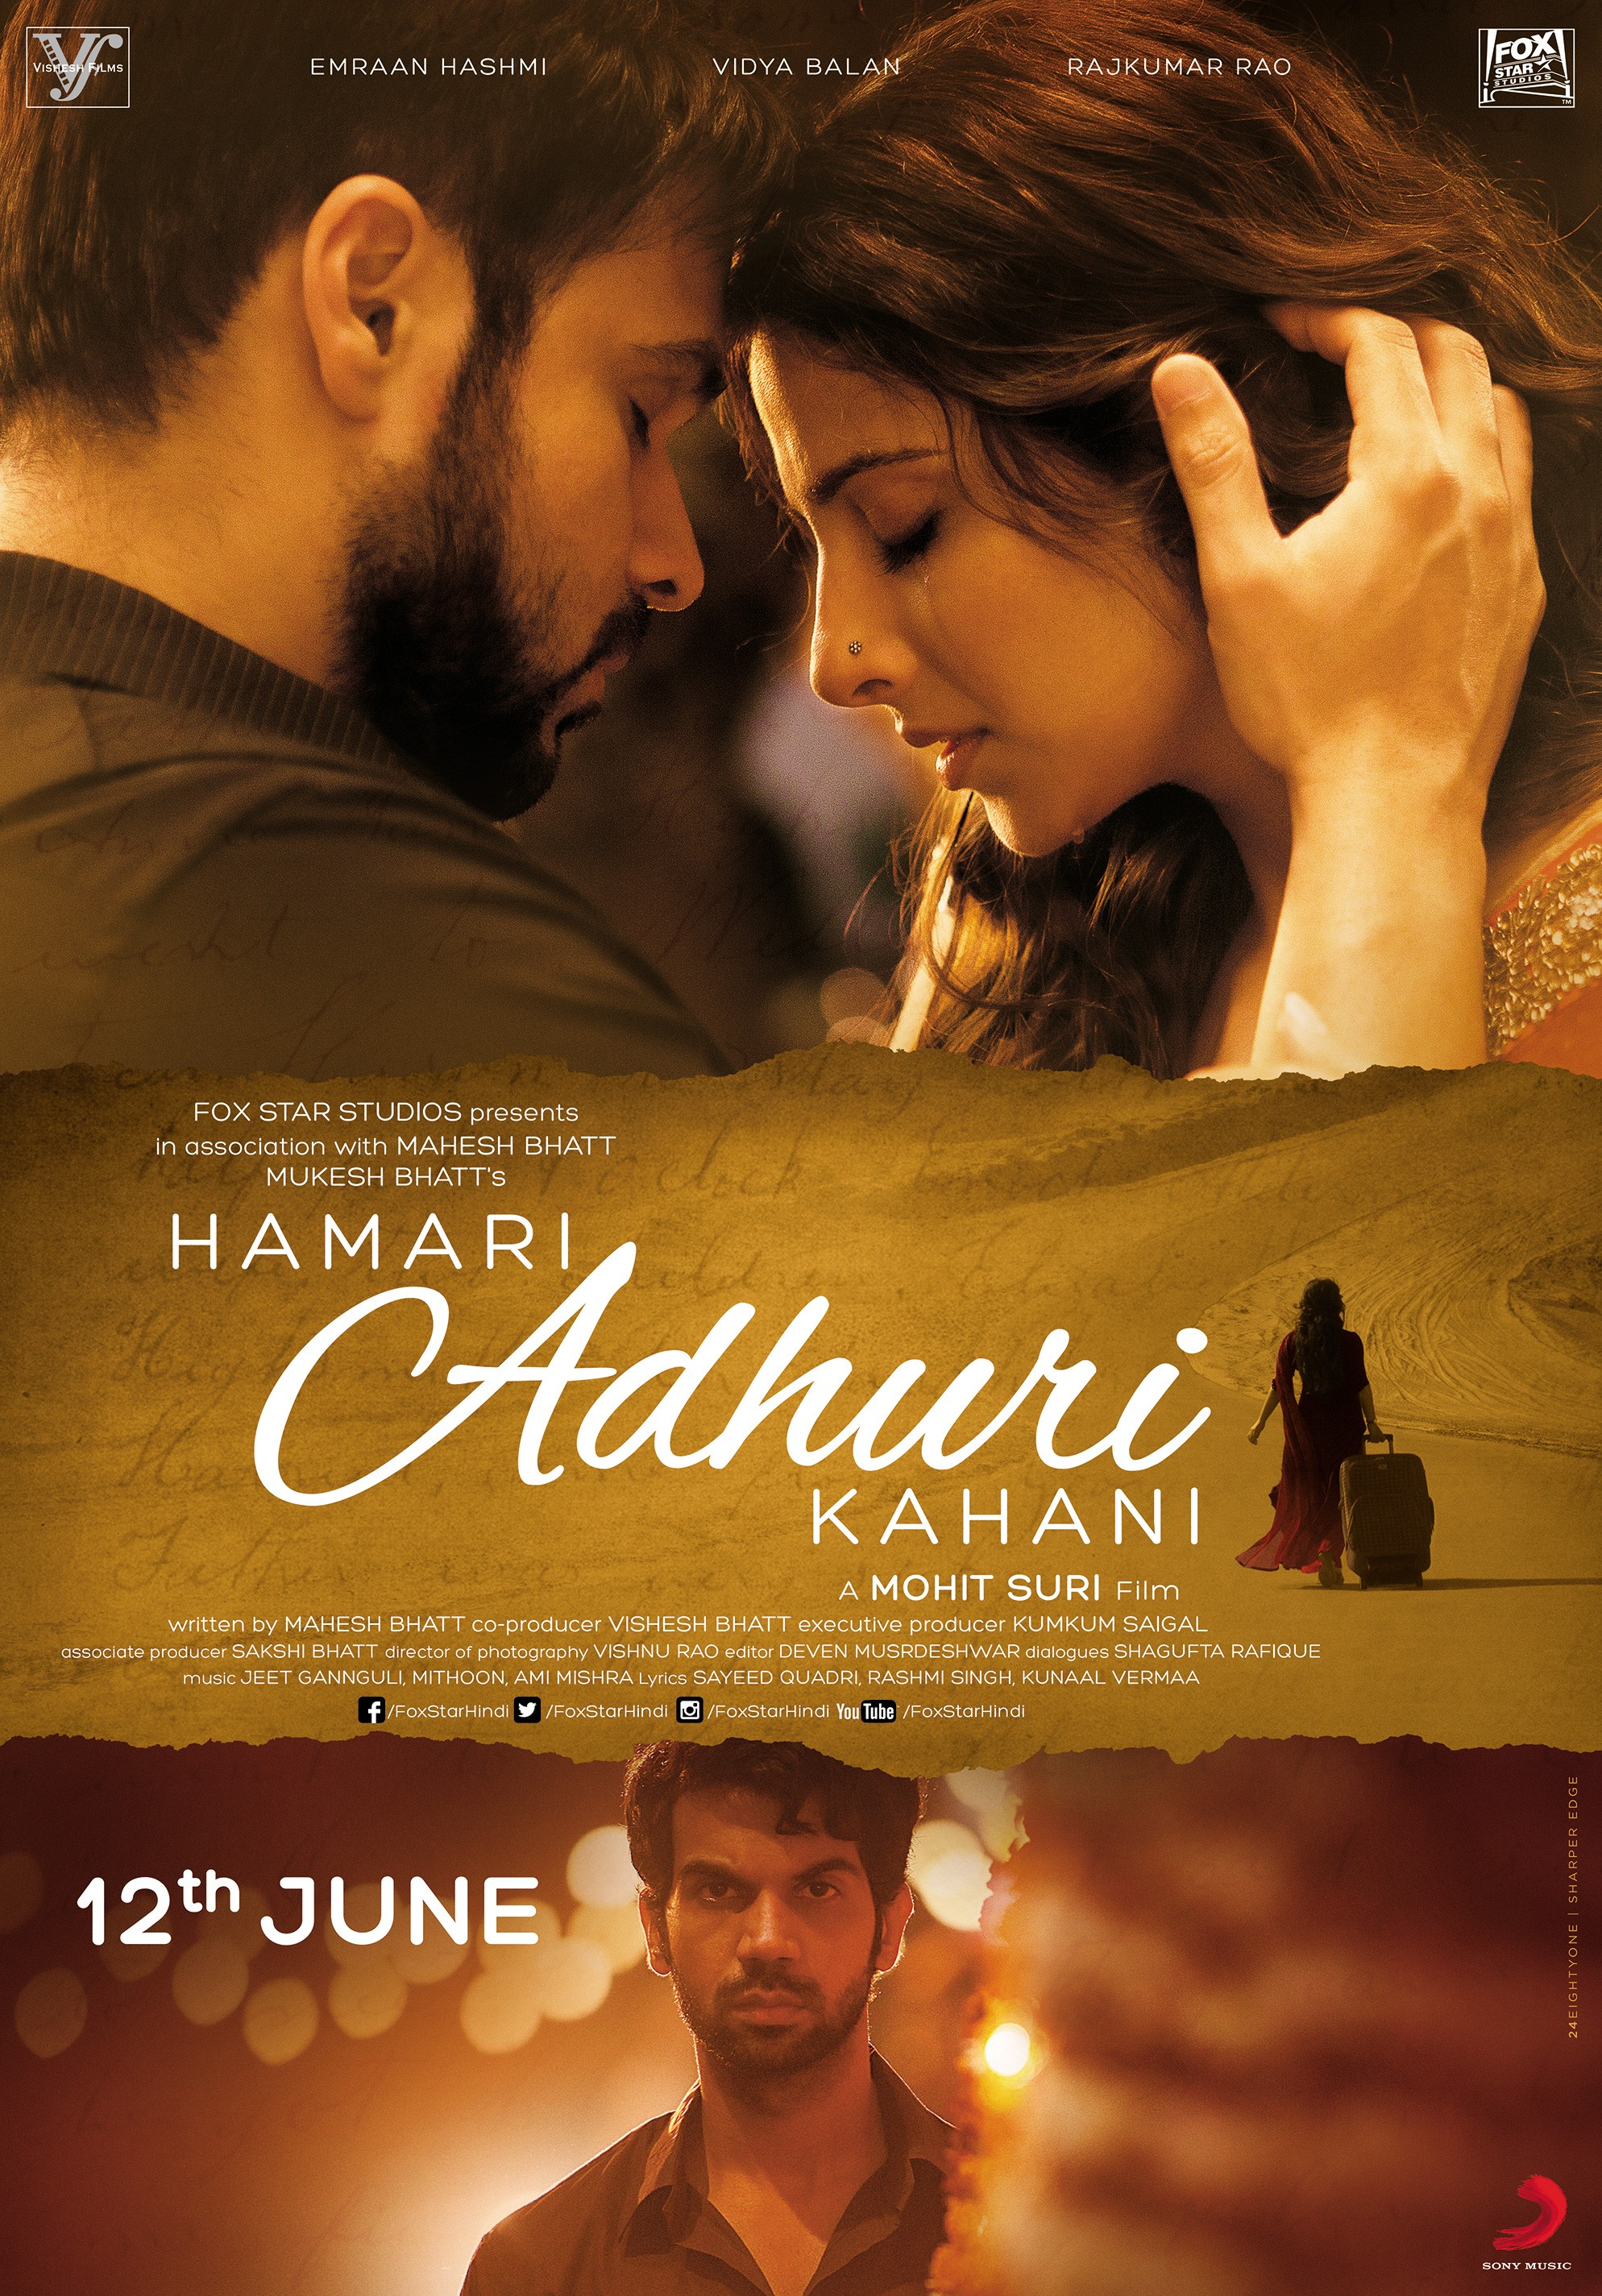 Hamari Adhuri Kahani Quotes 1